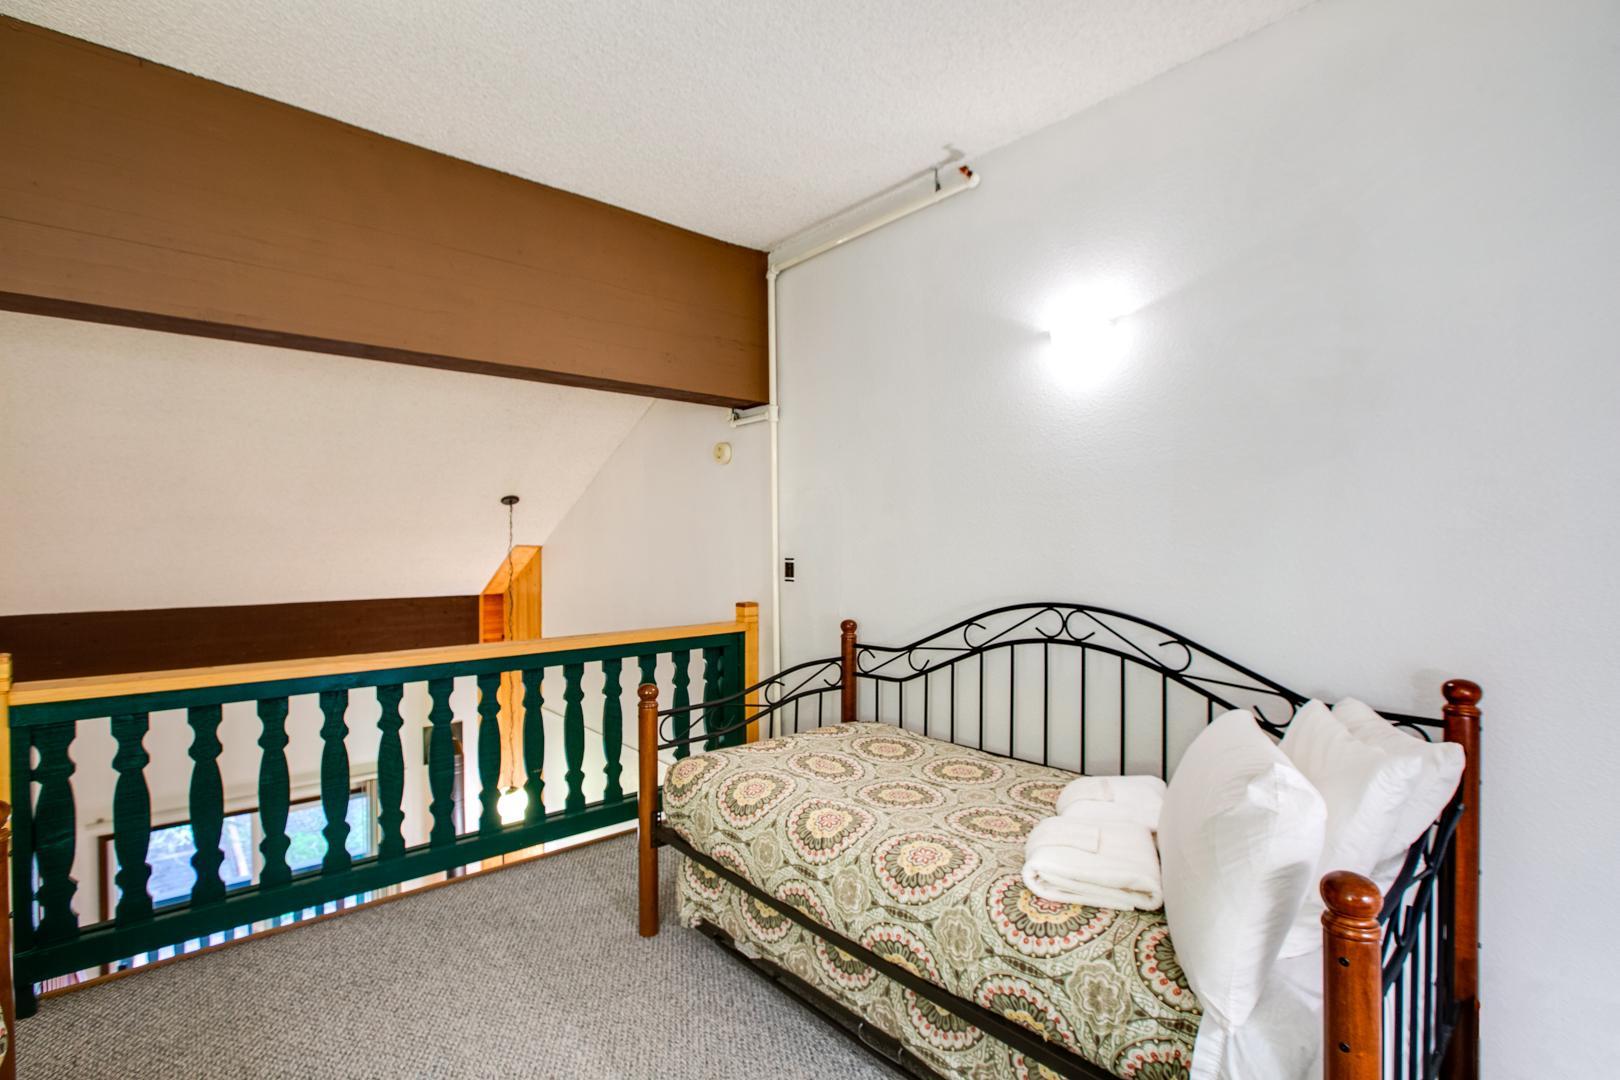 Apartment Mt  Baker Lodging Condo  56     FIREPLACE  INEXPENSIVE  KITCHENETTE  WIFI  SLEEPS-4  photo 31816886